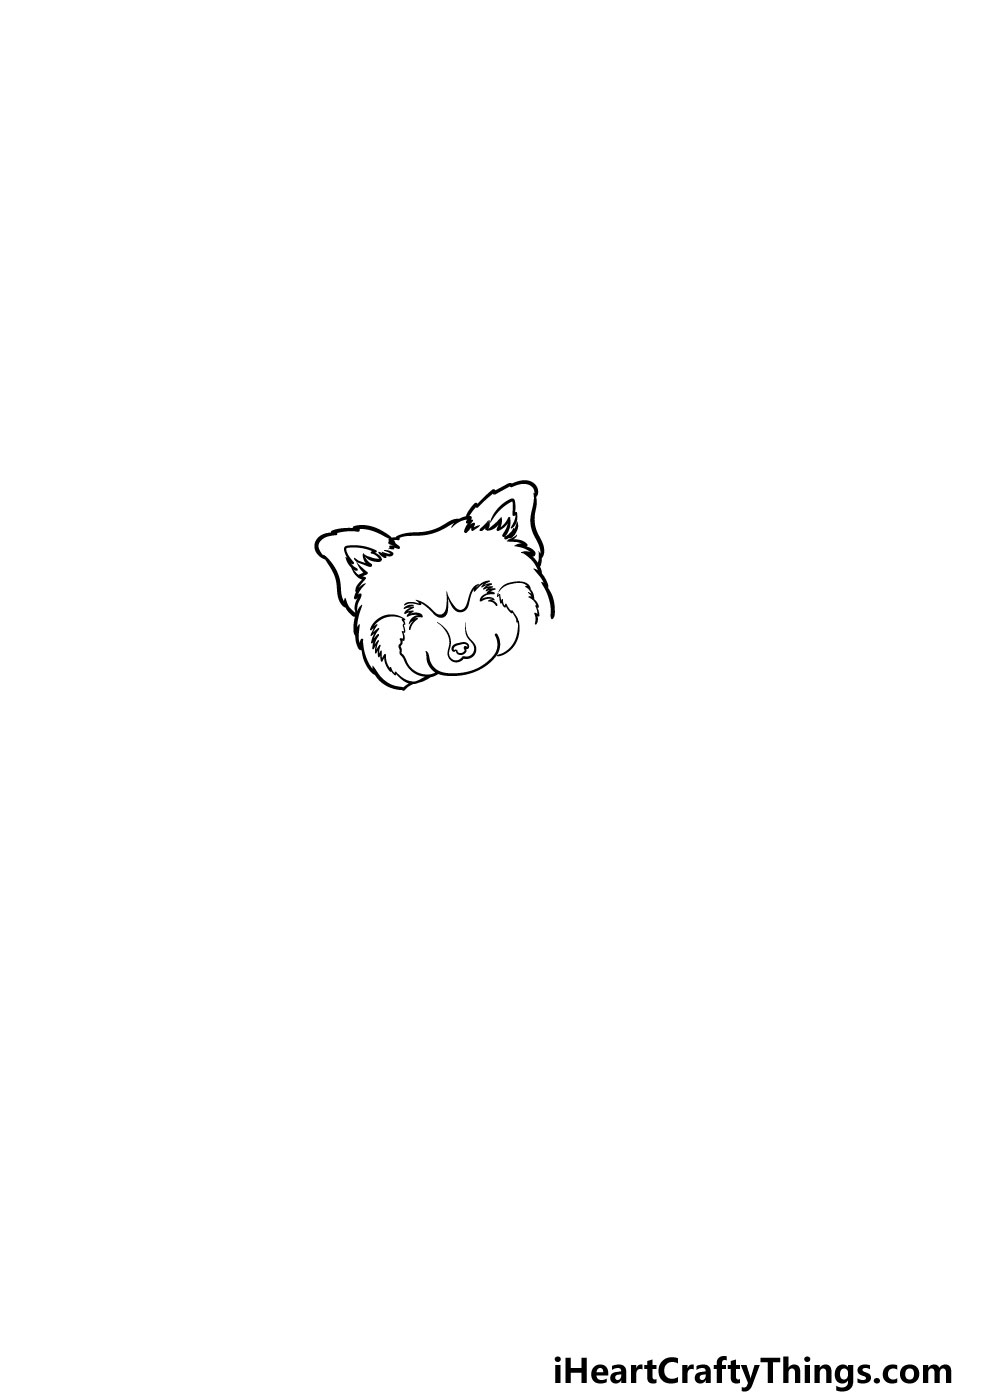 drawing a Red Panda step 1